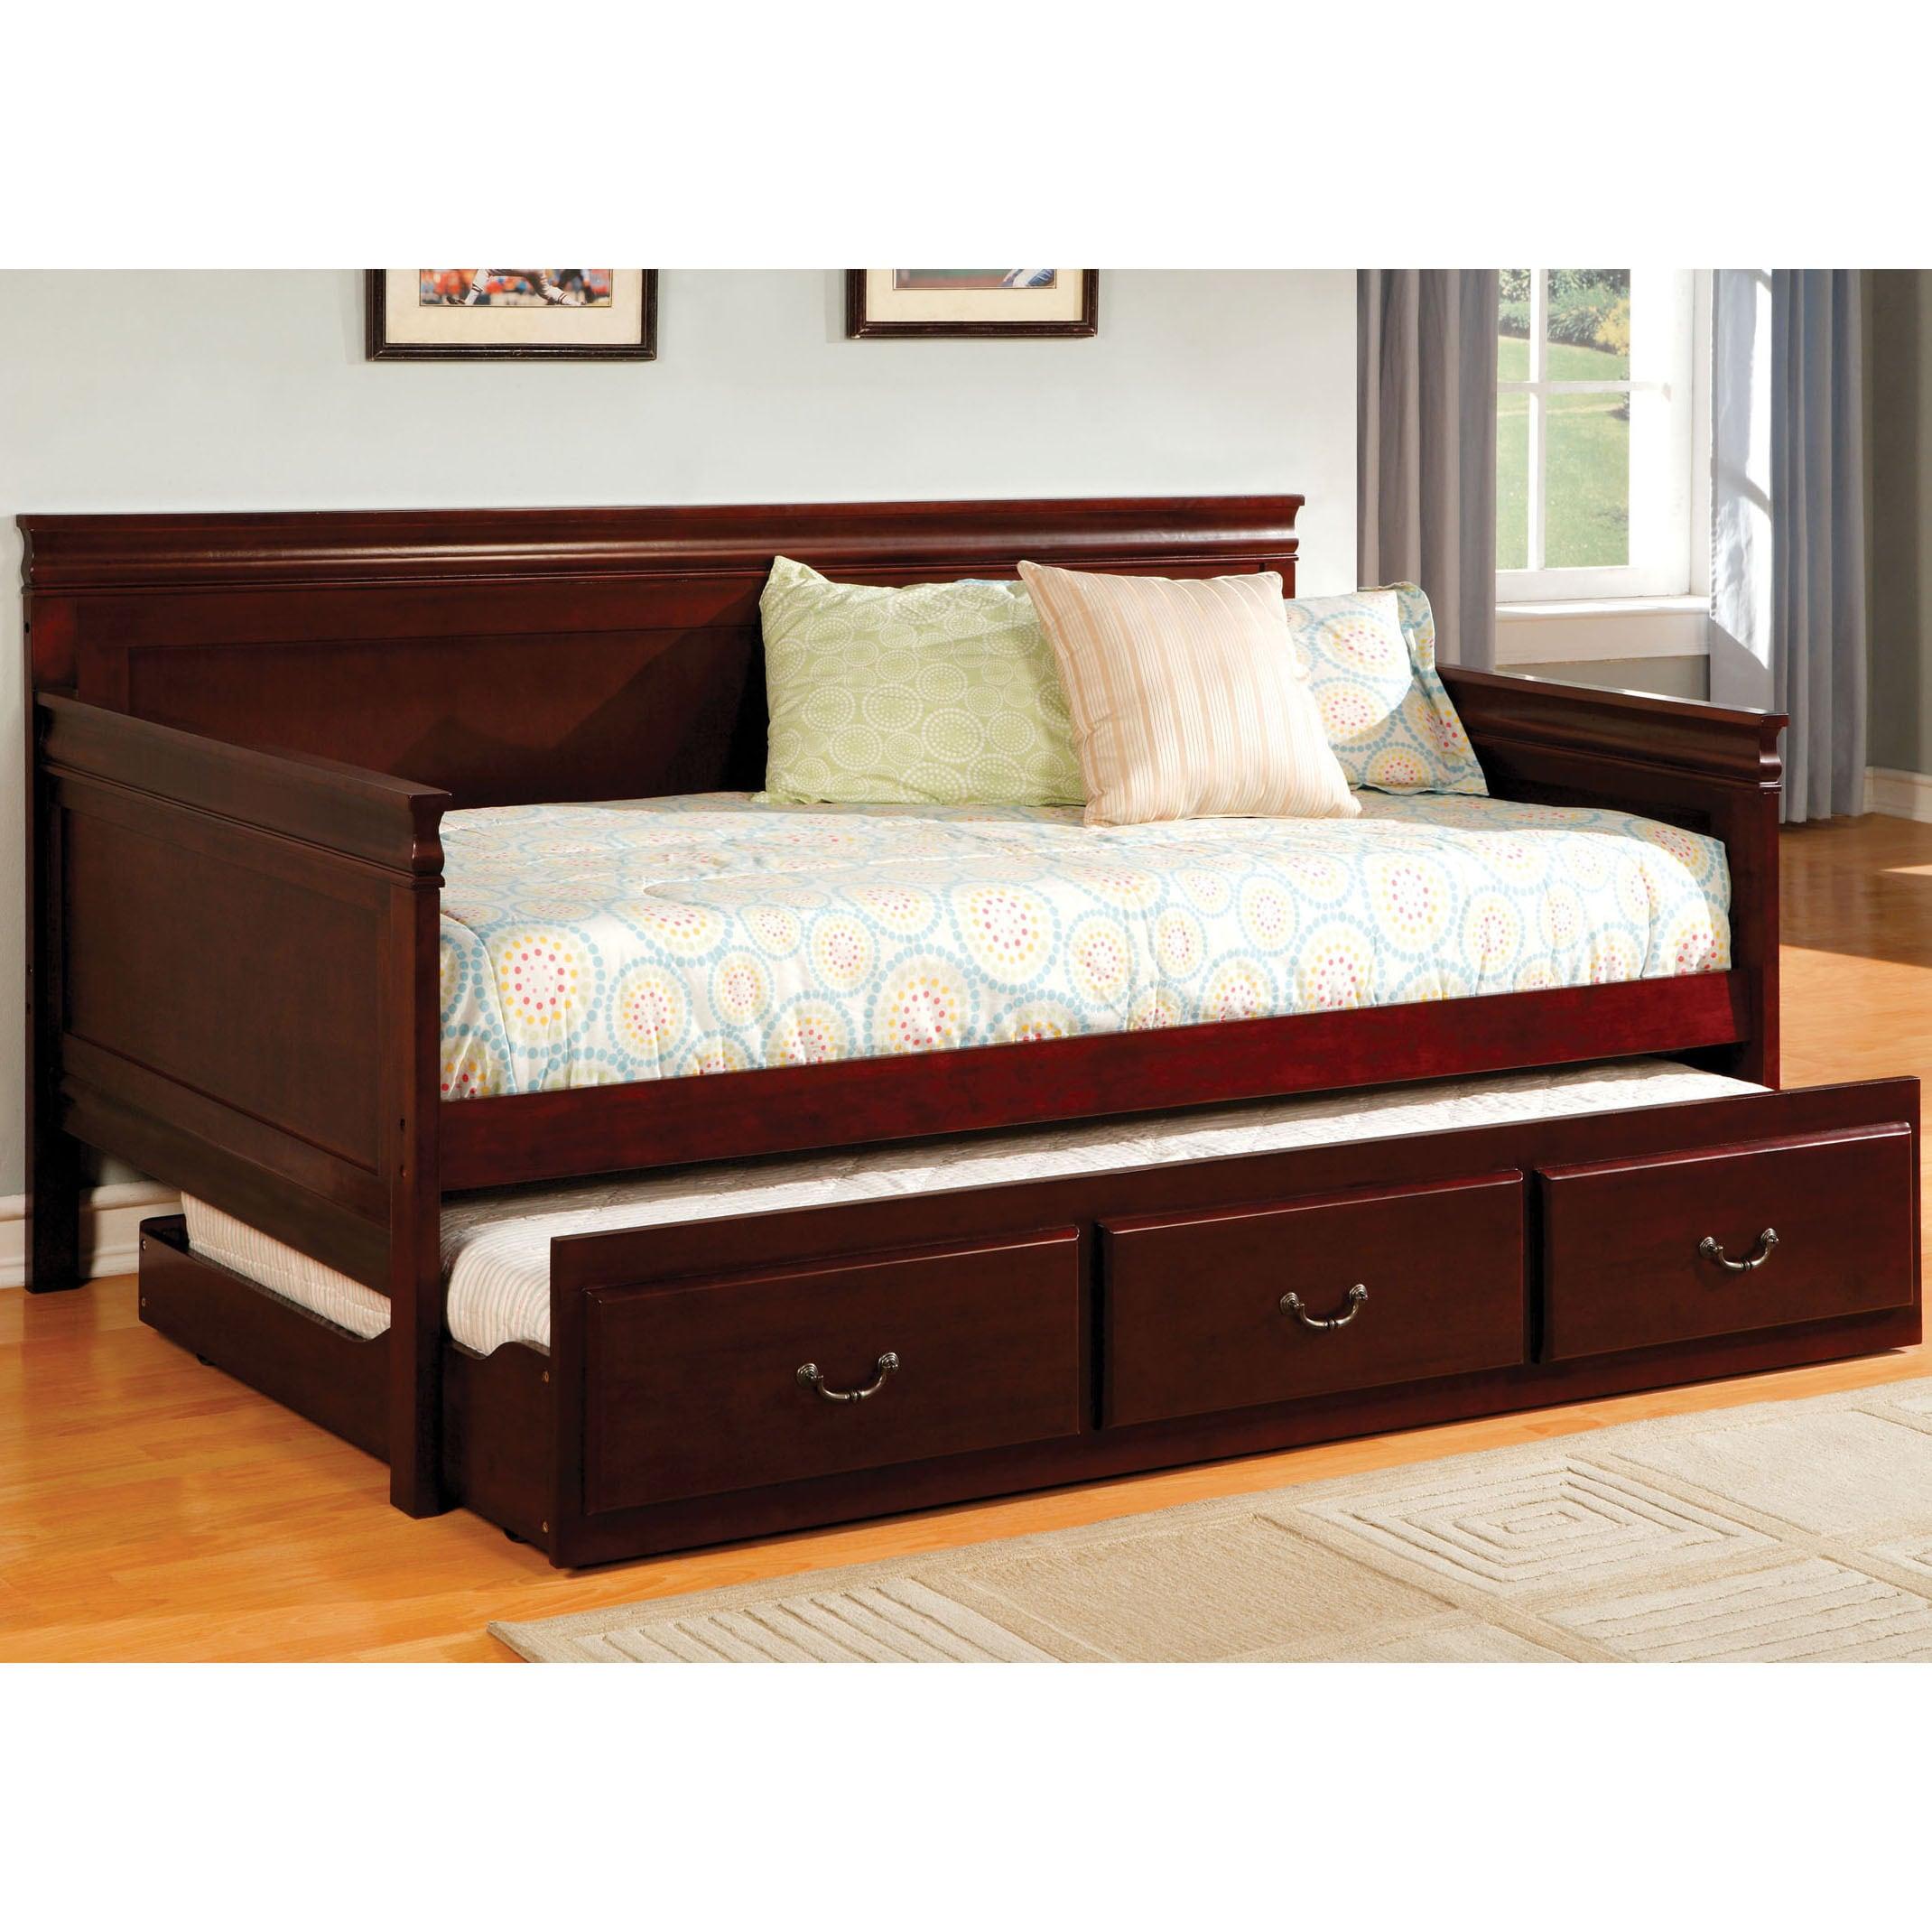 Furniture of America Bausine English Style Platform Daybe...